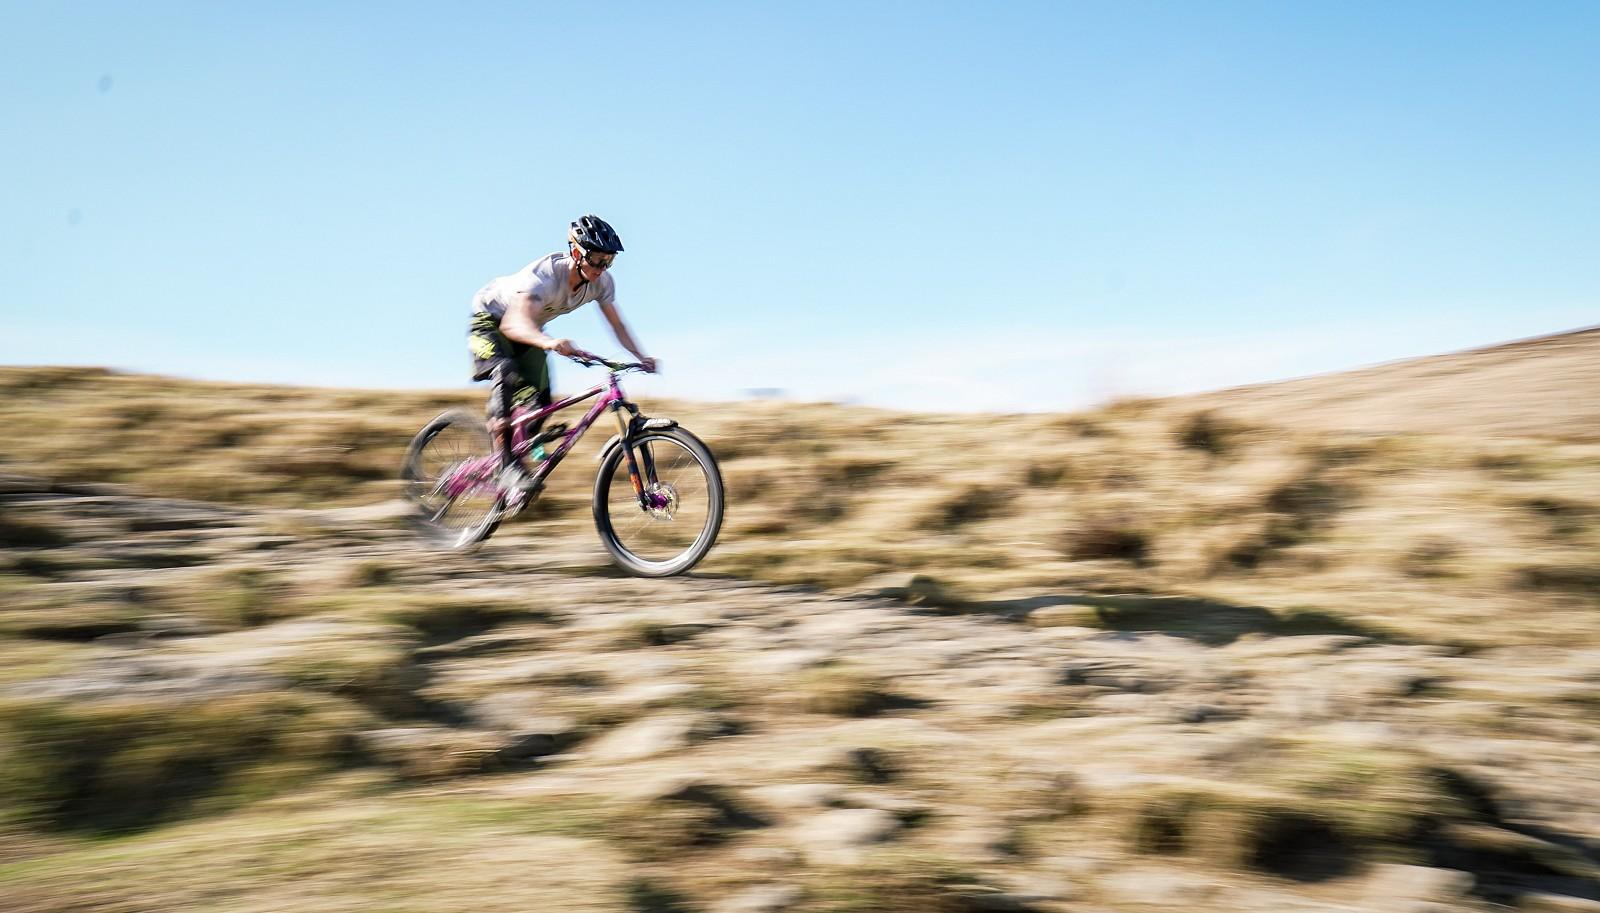 DSC08999 (2) - Mushrum - Mountain Biking Pictures - Vital MTB